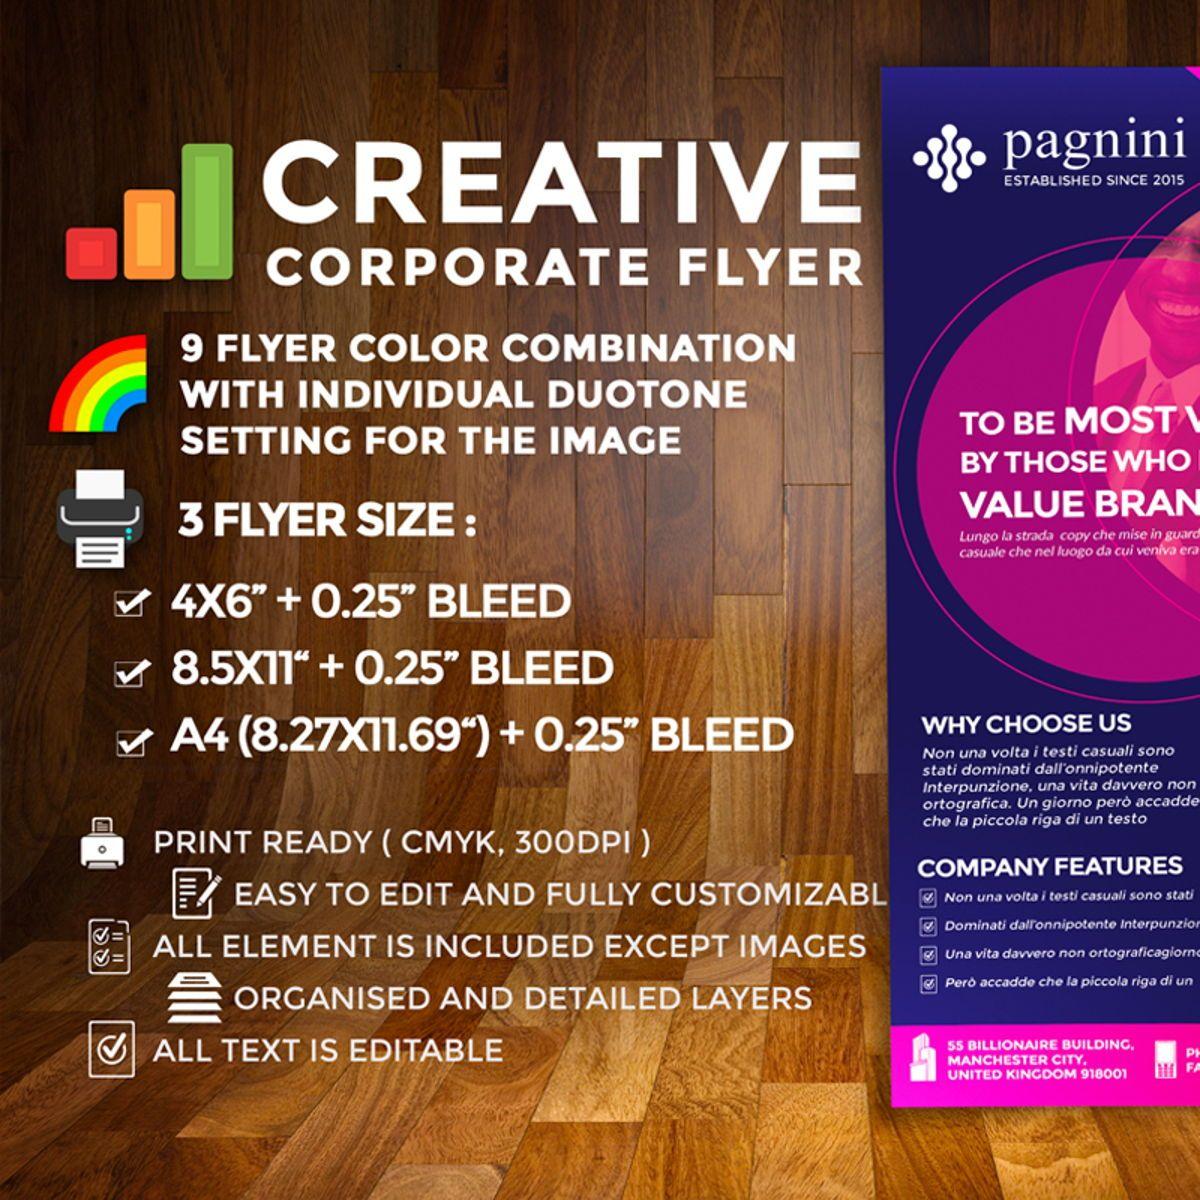 Creative Corporate Flyer, 08524, Business — PoweredTemplate.com